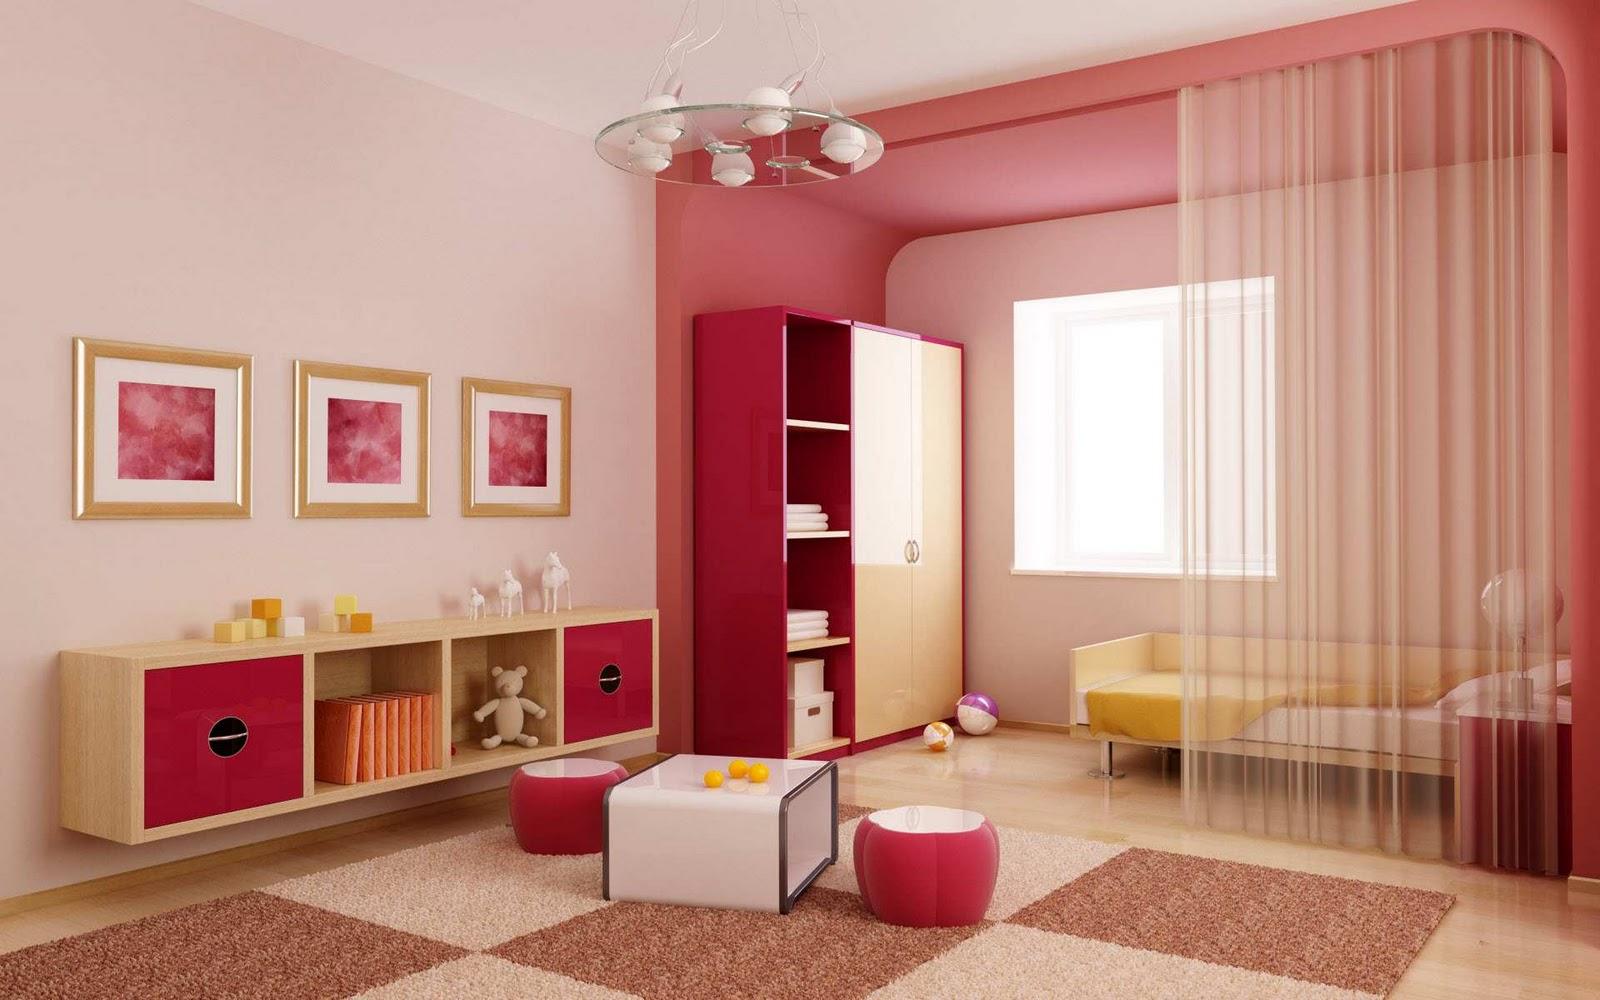 بالصور ديكورات غرف نوم للعرسان , احدث موديلات غرف النوم 3227 8